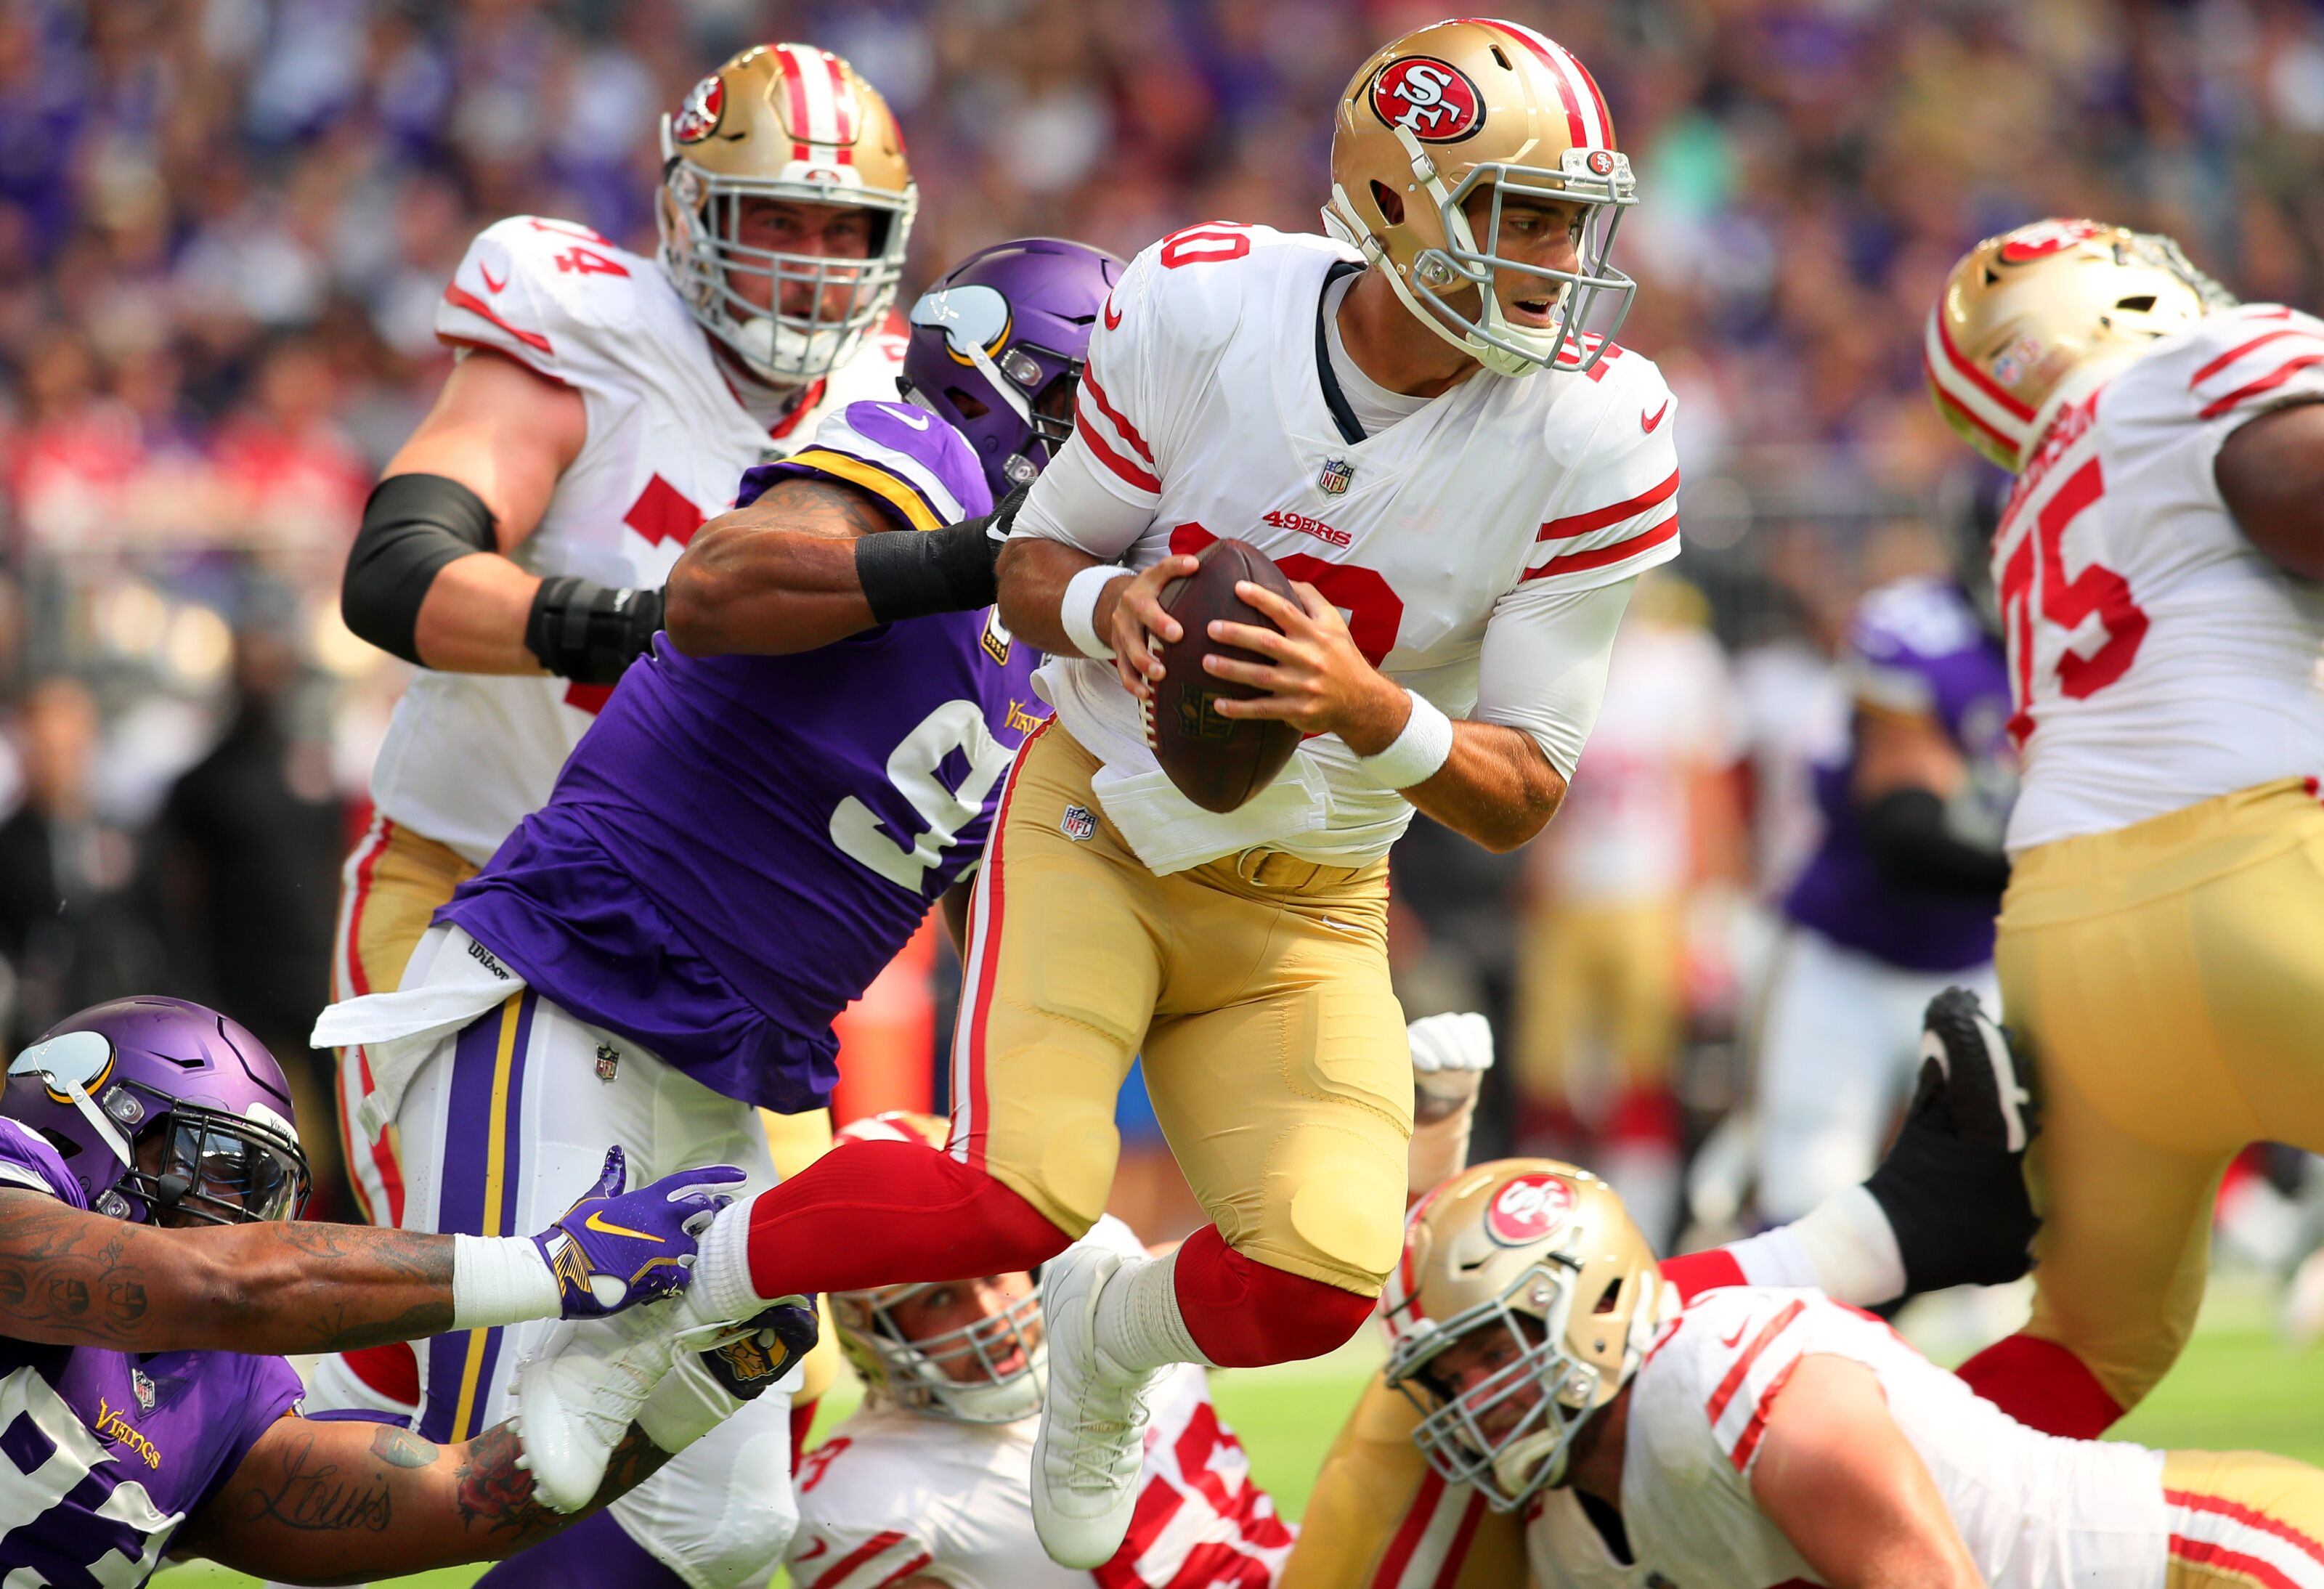 e883801f3 San Francisco 49ers: 3 Big takeaways from loss vs. Vikings in Week 1